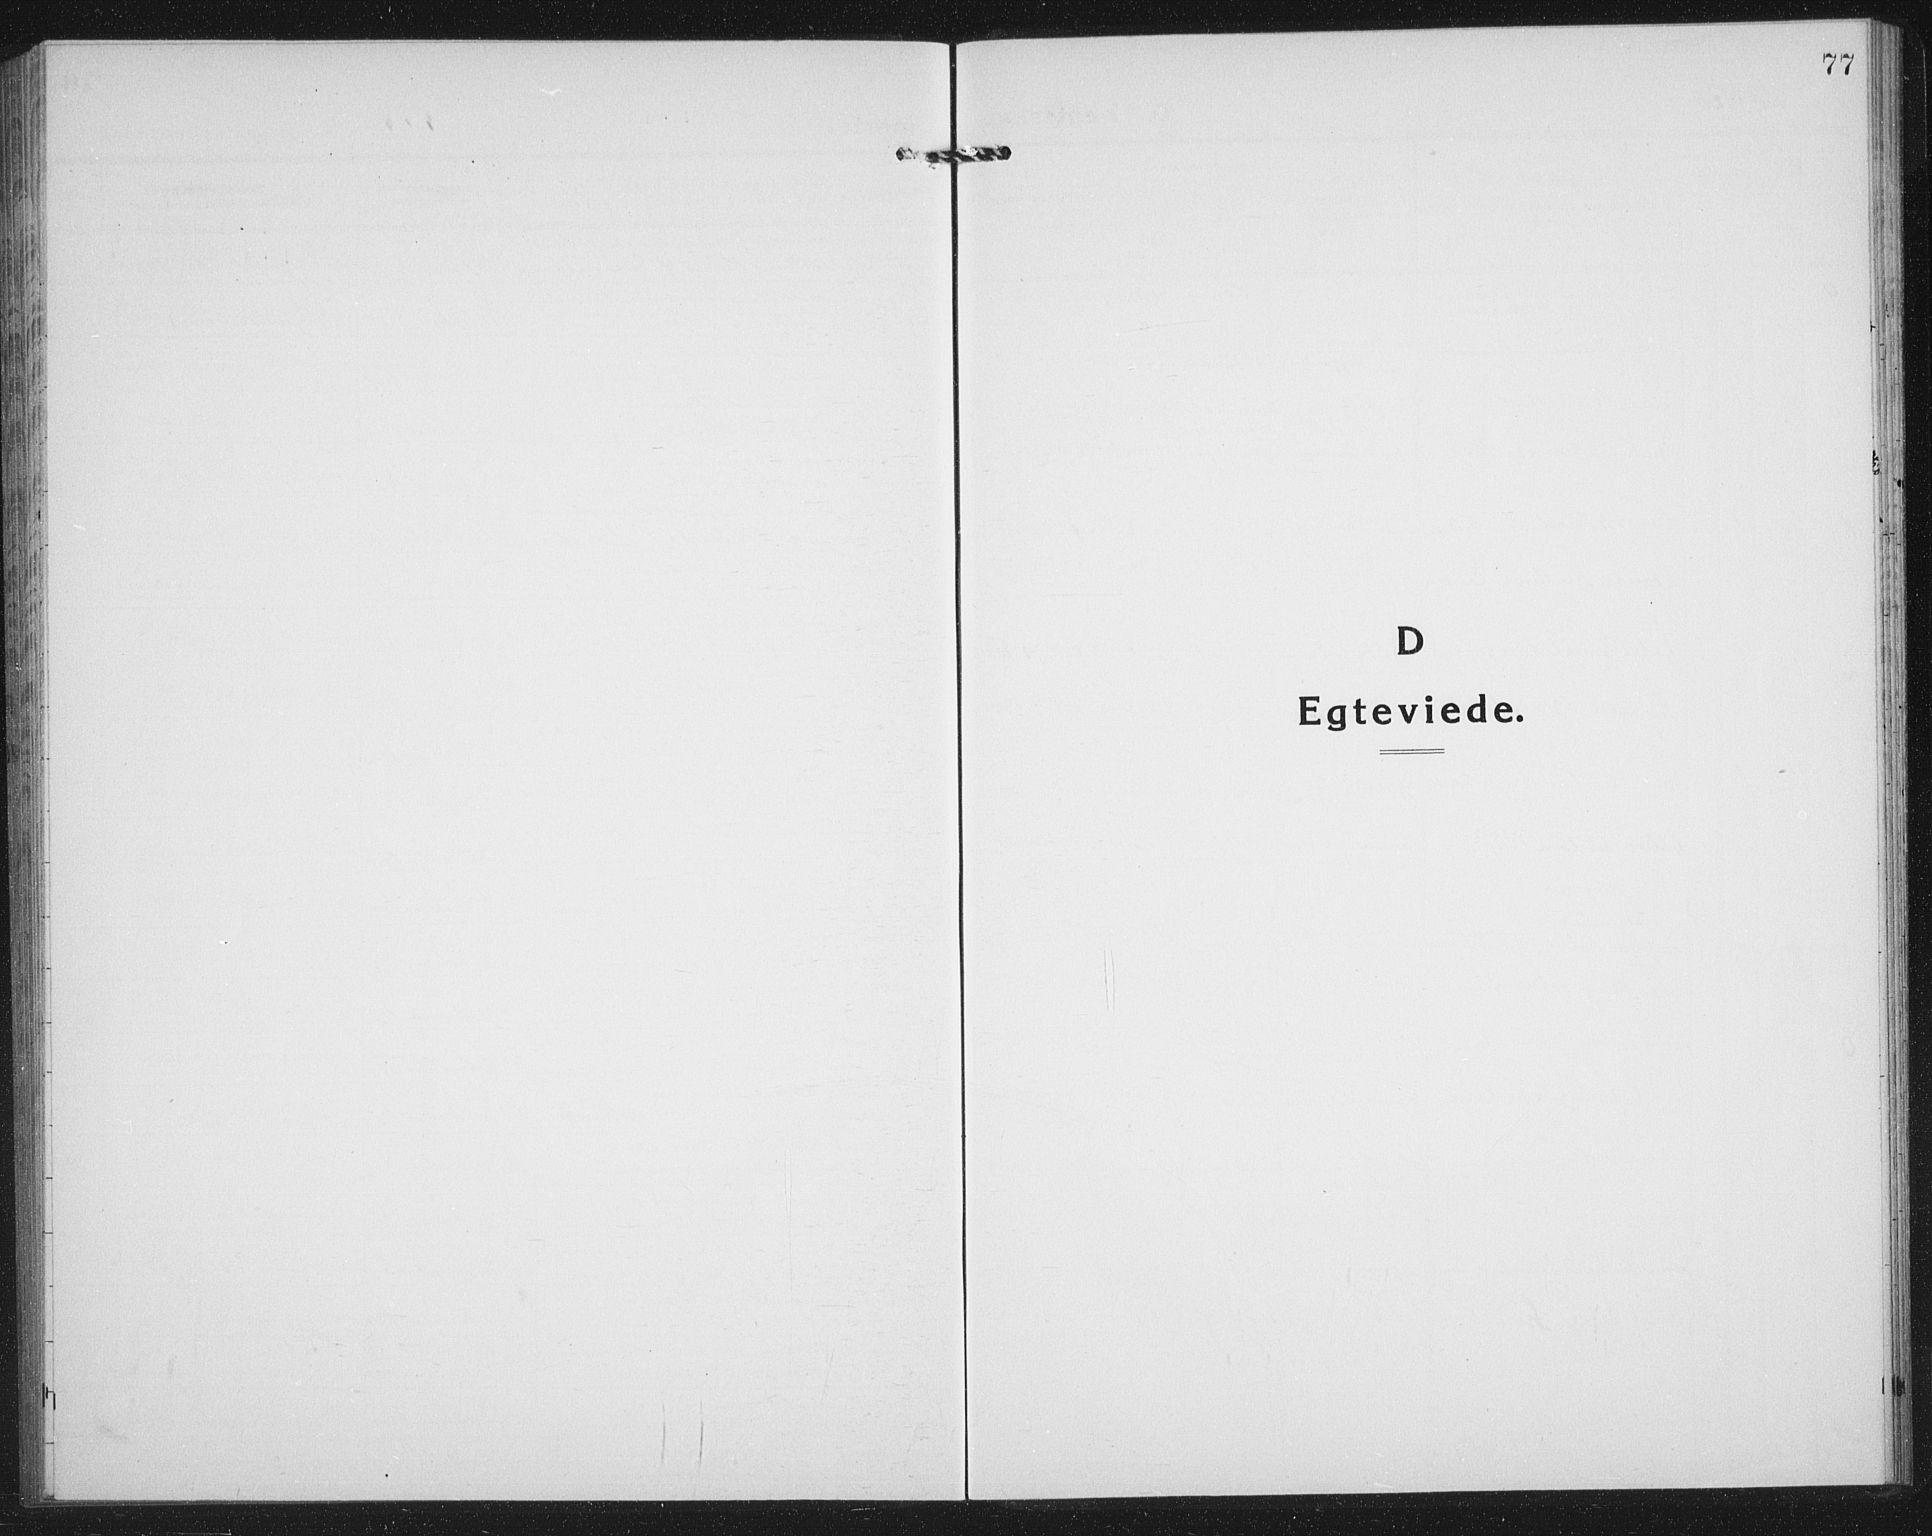 SATØ, Mefjord/Berg sokneprestkontor, G/Ga/Gab/L0007klokker: Klokkerbok nr. 7, 1922-1936, s. 77